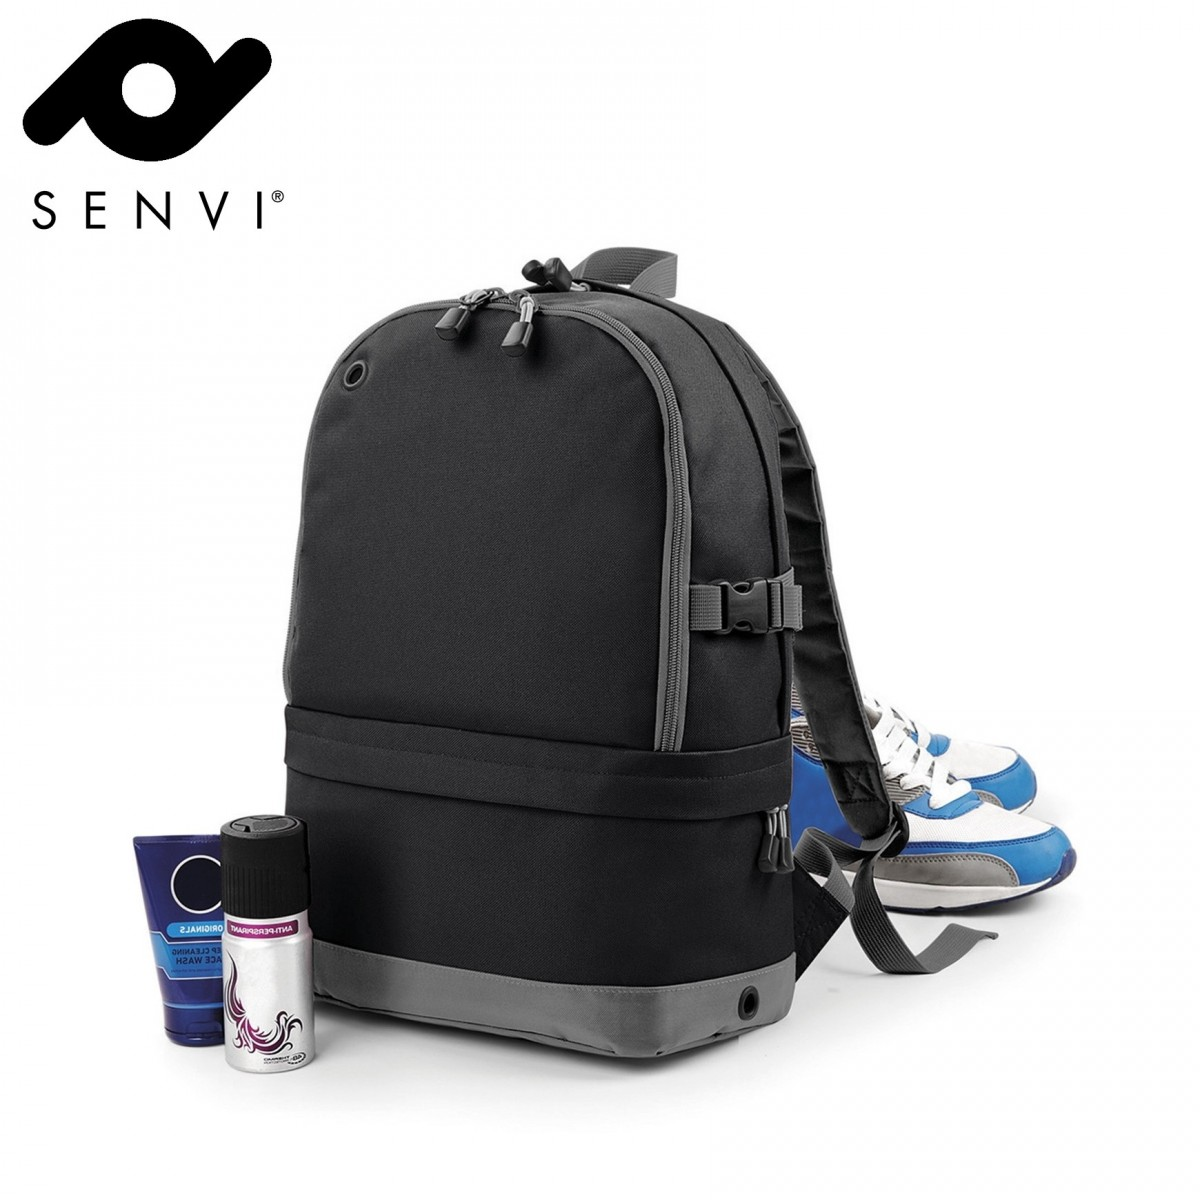 Senvi Sports Pro Rugzak kleur Zwart Grijs (waterafstotend)